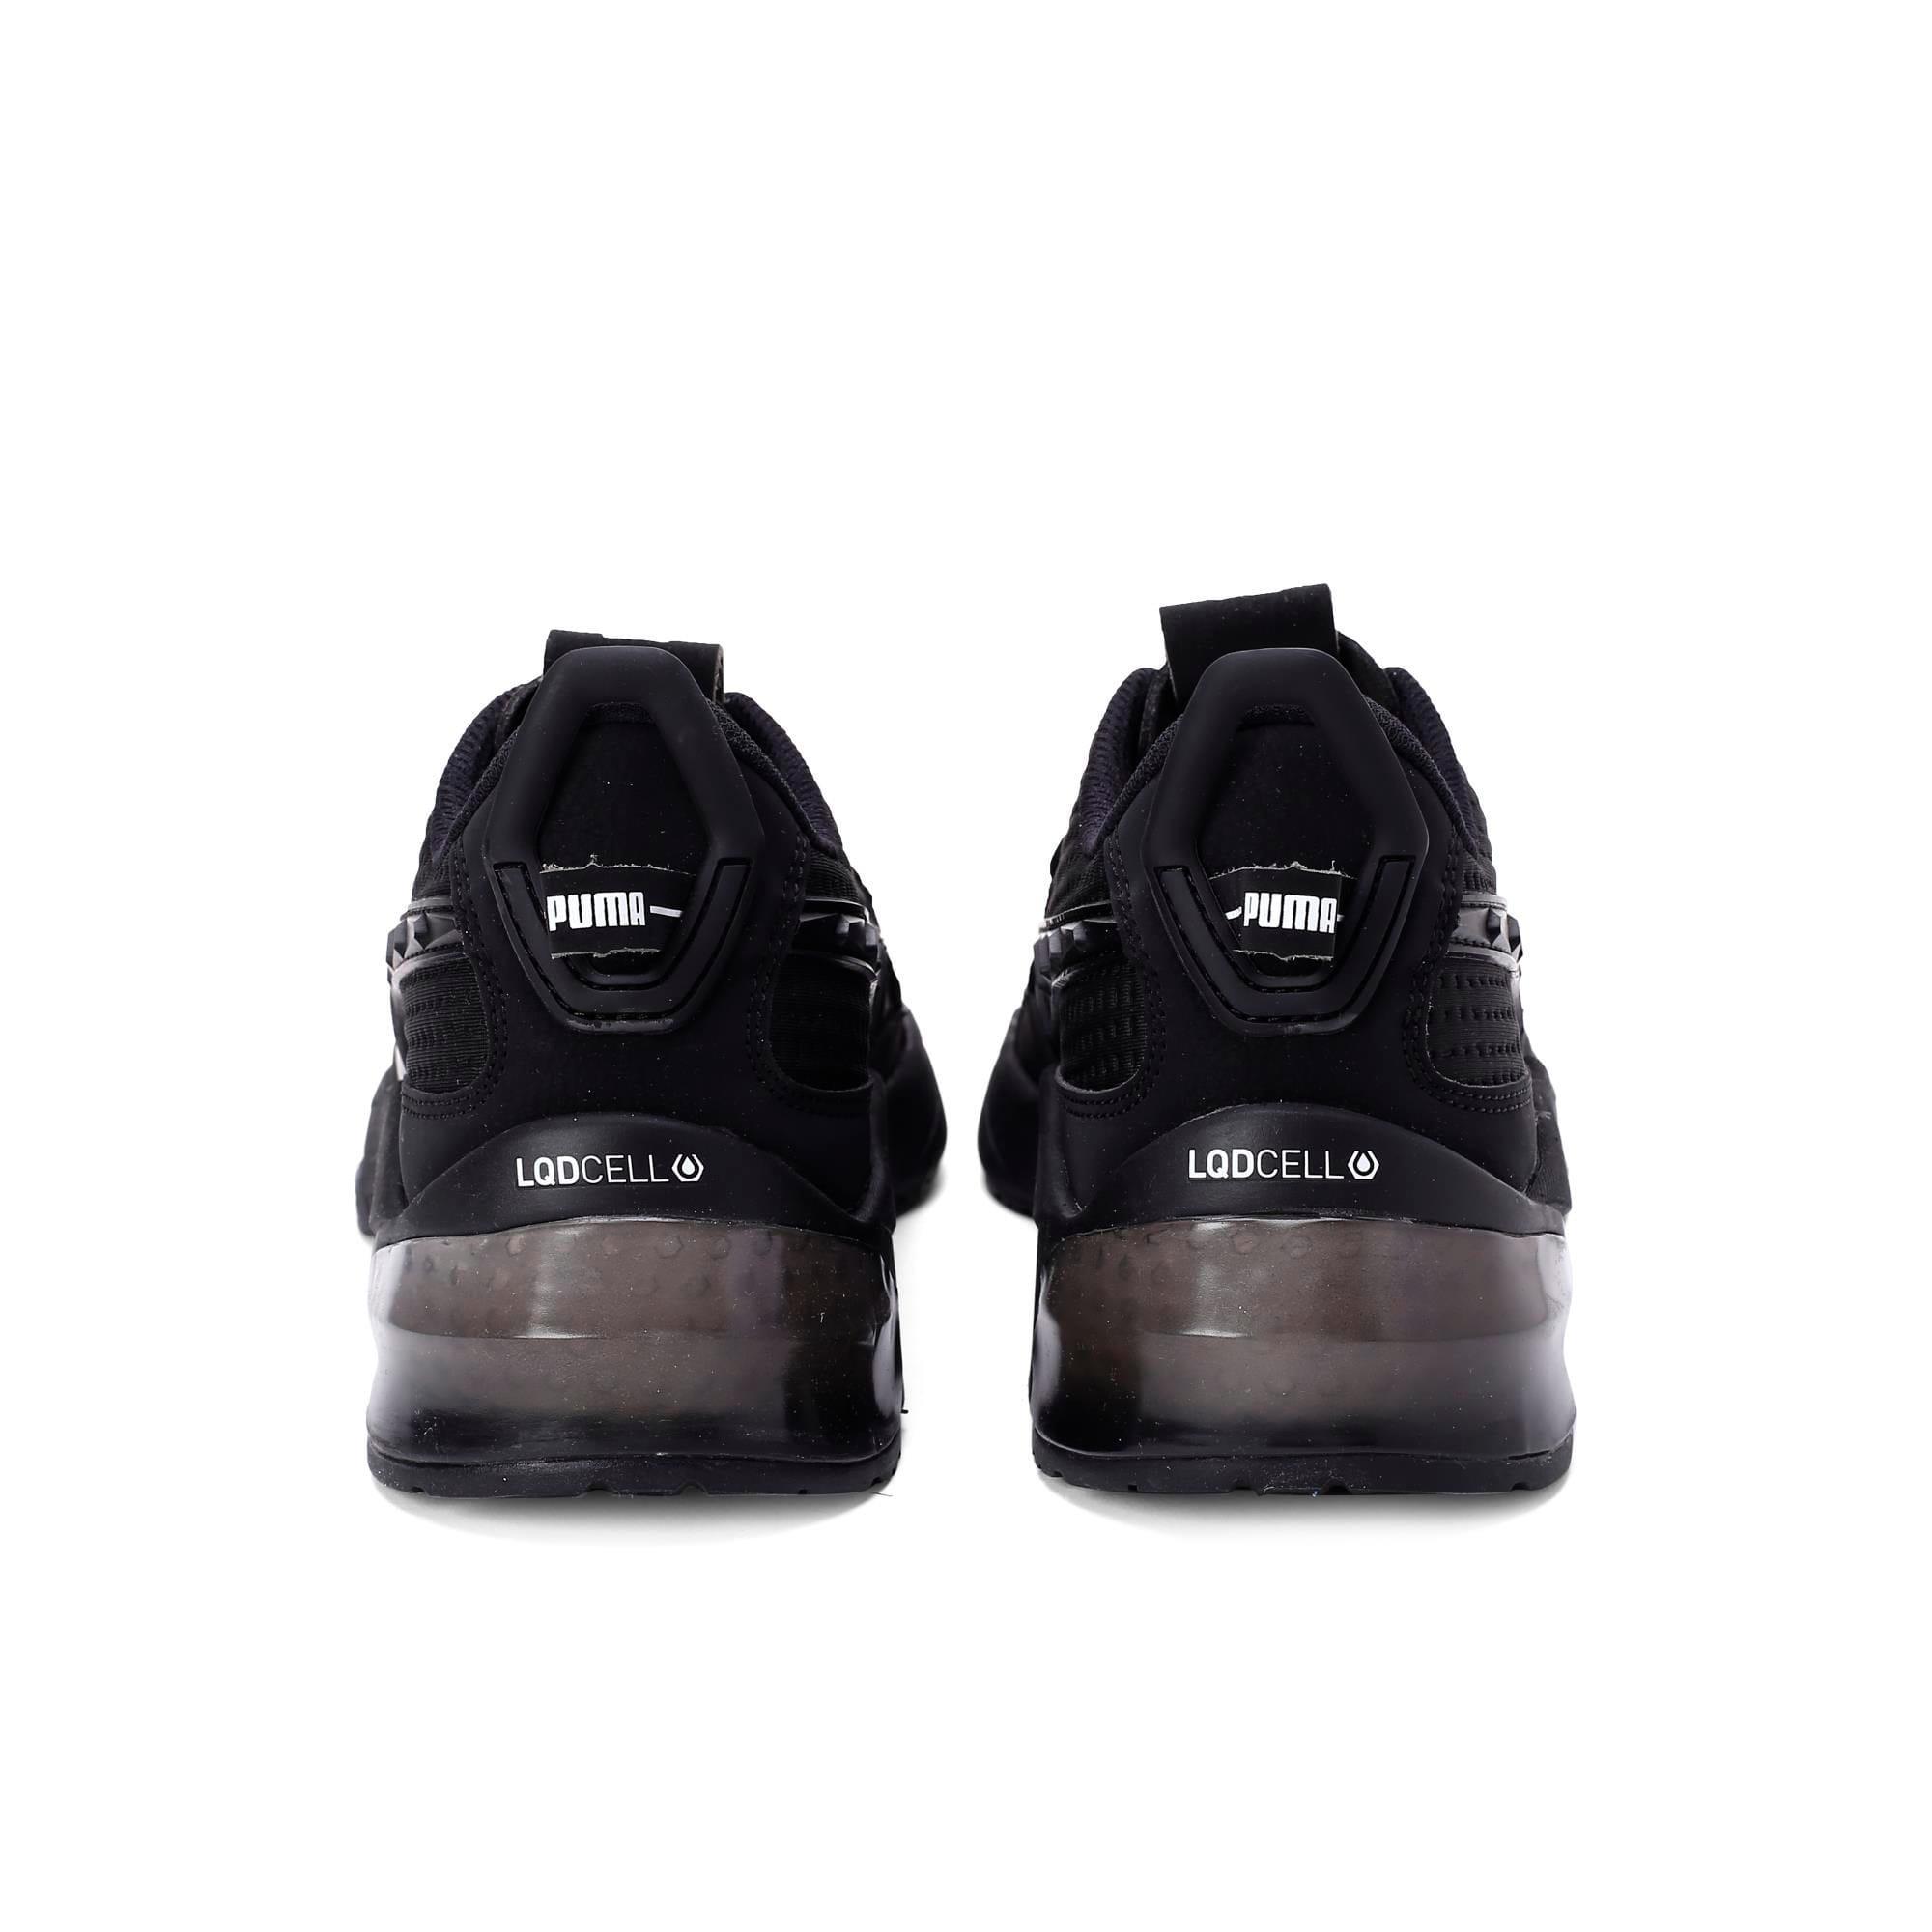 Thumbnail 5 of LQDCELL Optic Flight Suit Men's Running Shoes, Puma Black, medium-IND